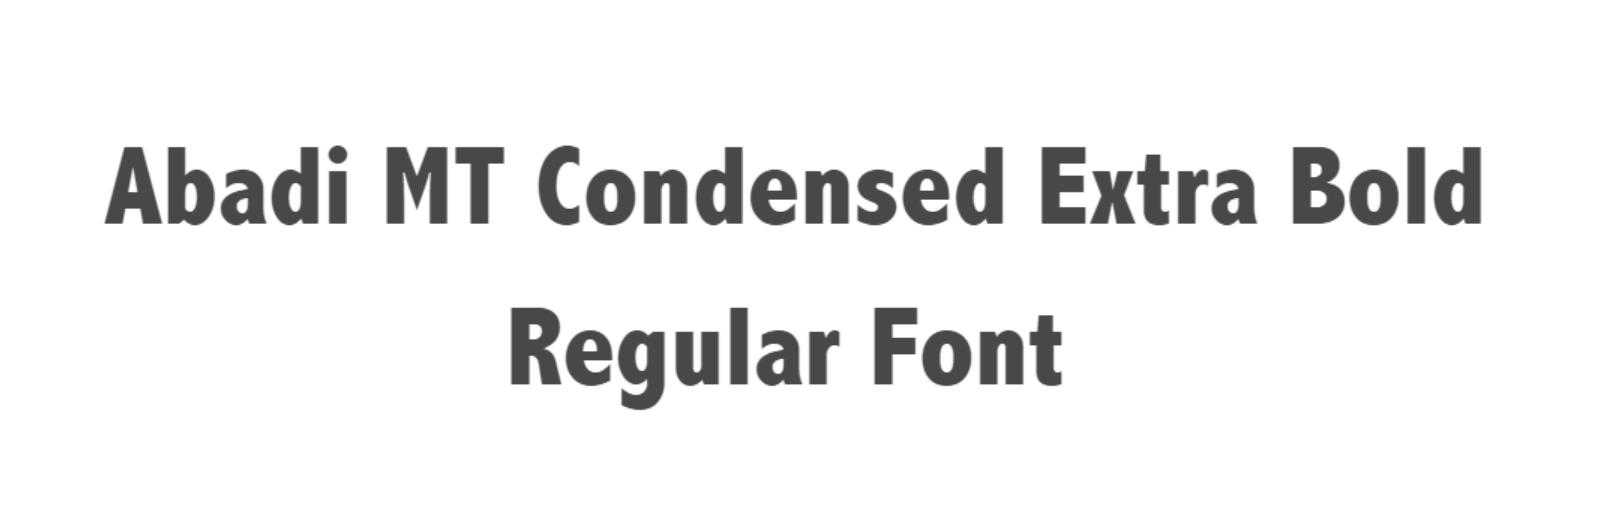 Abadi MT Condensed Extra Bold Regular Font